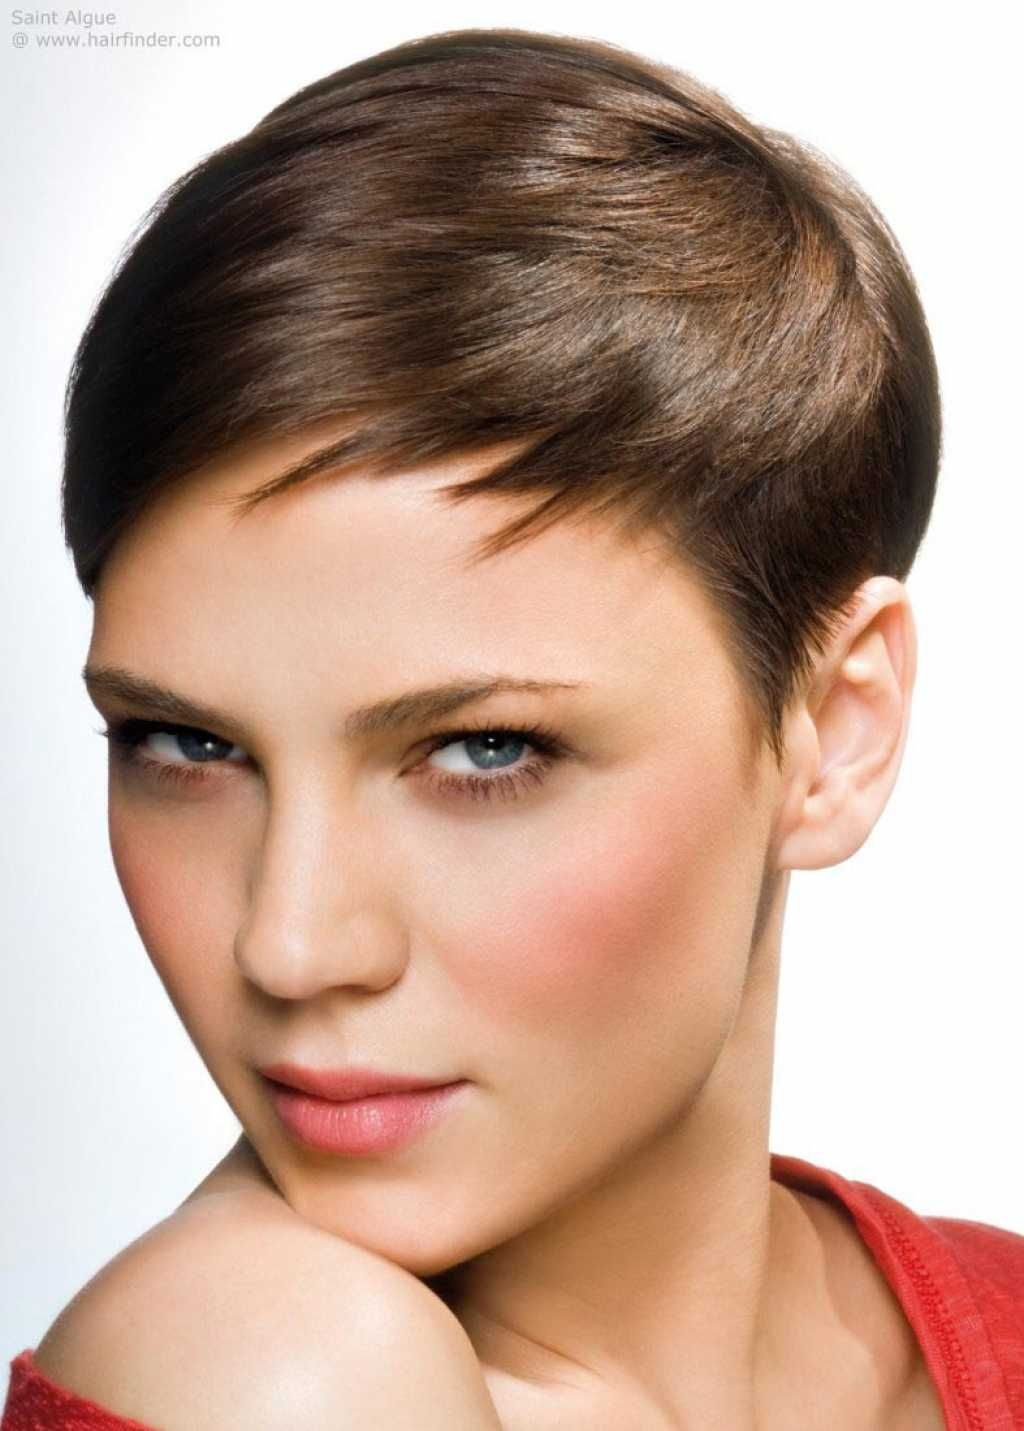 Hazelnut hair color onelady hair hairs hairstyle